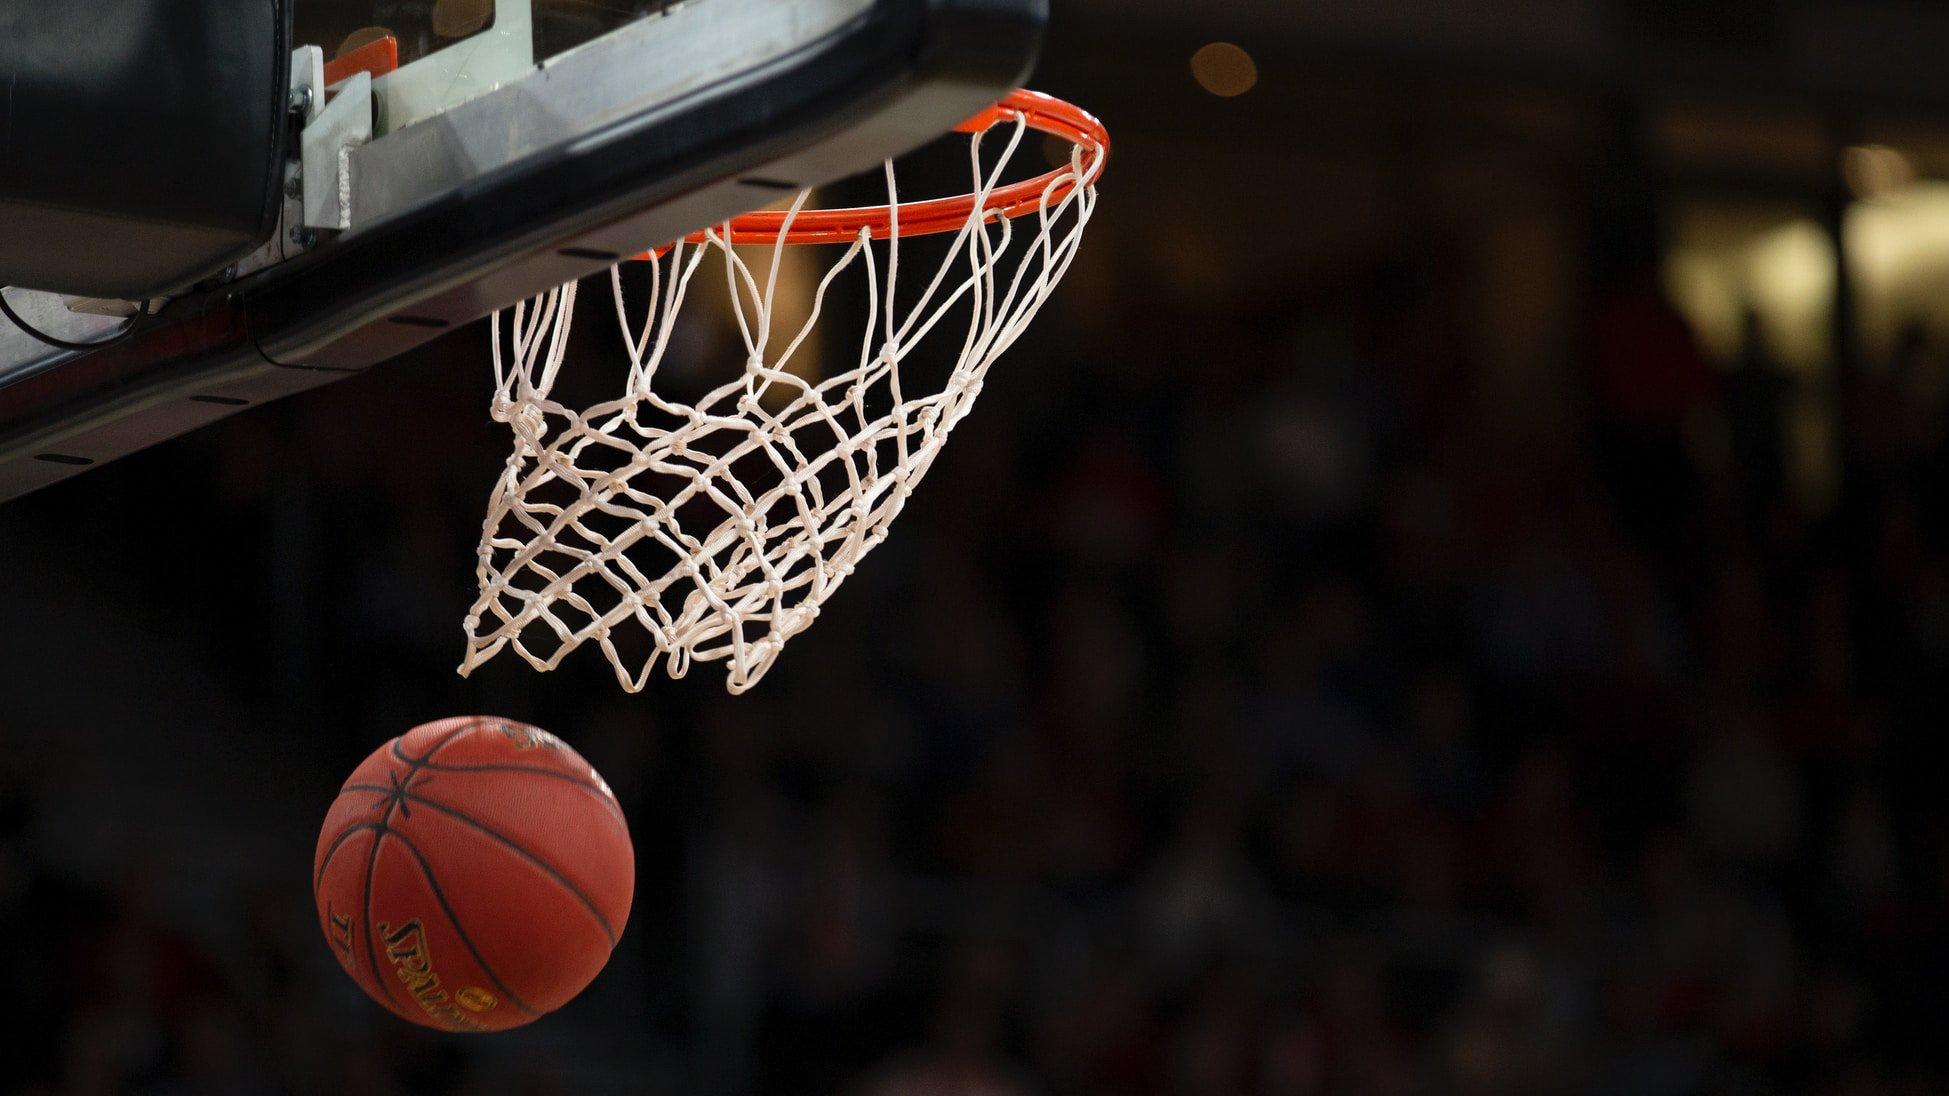 Ben Simmons Odds: Trail Blazers, Wizards Frontrunners in Trade Rumors